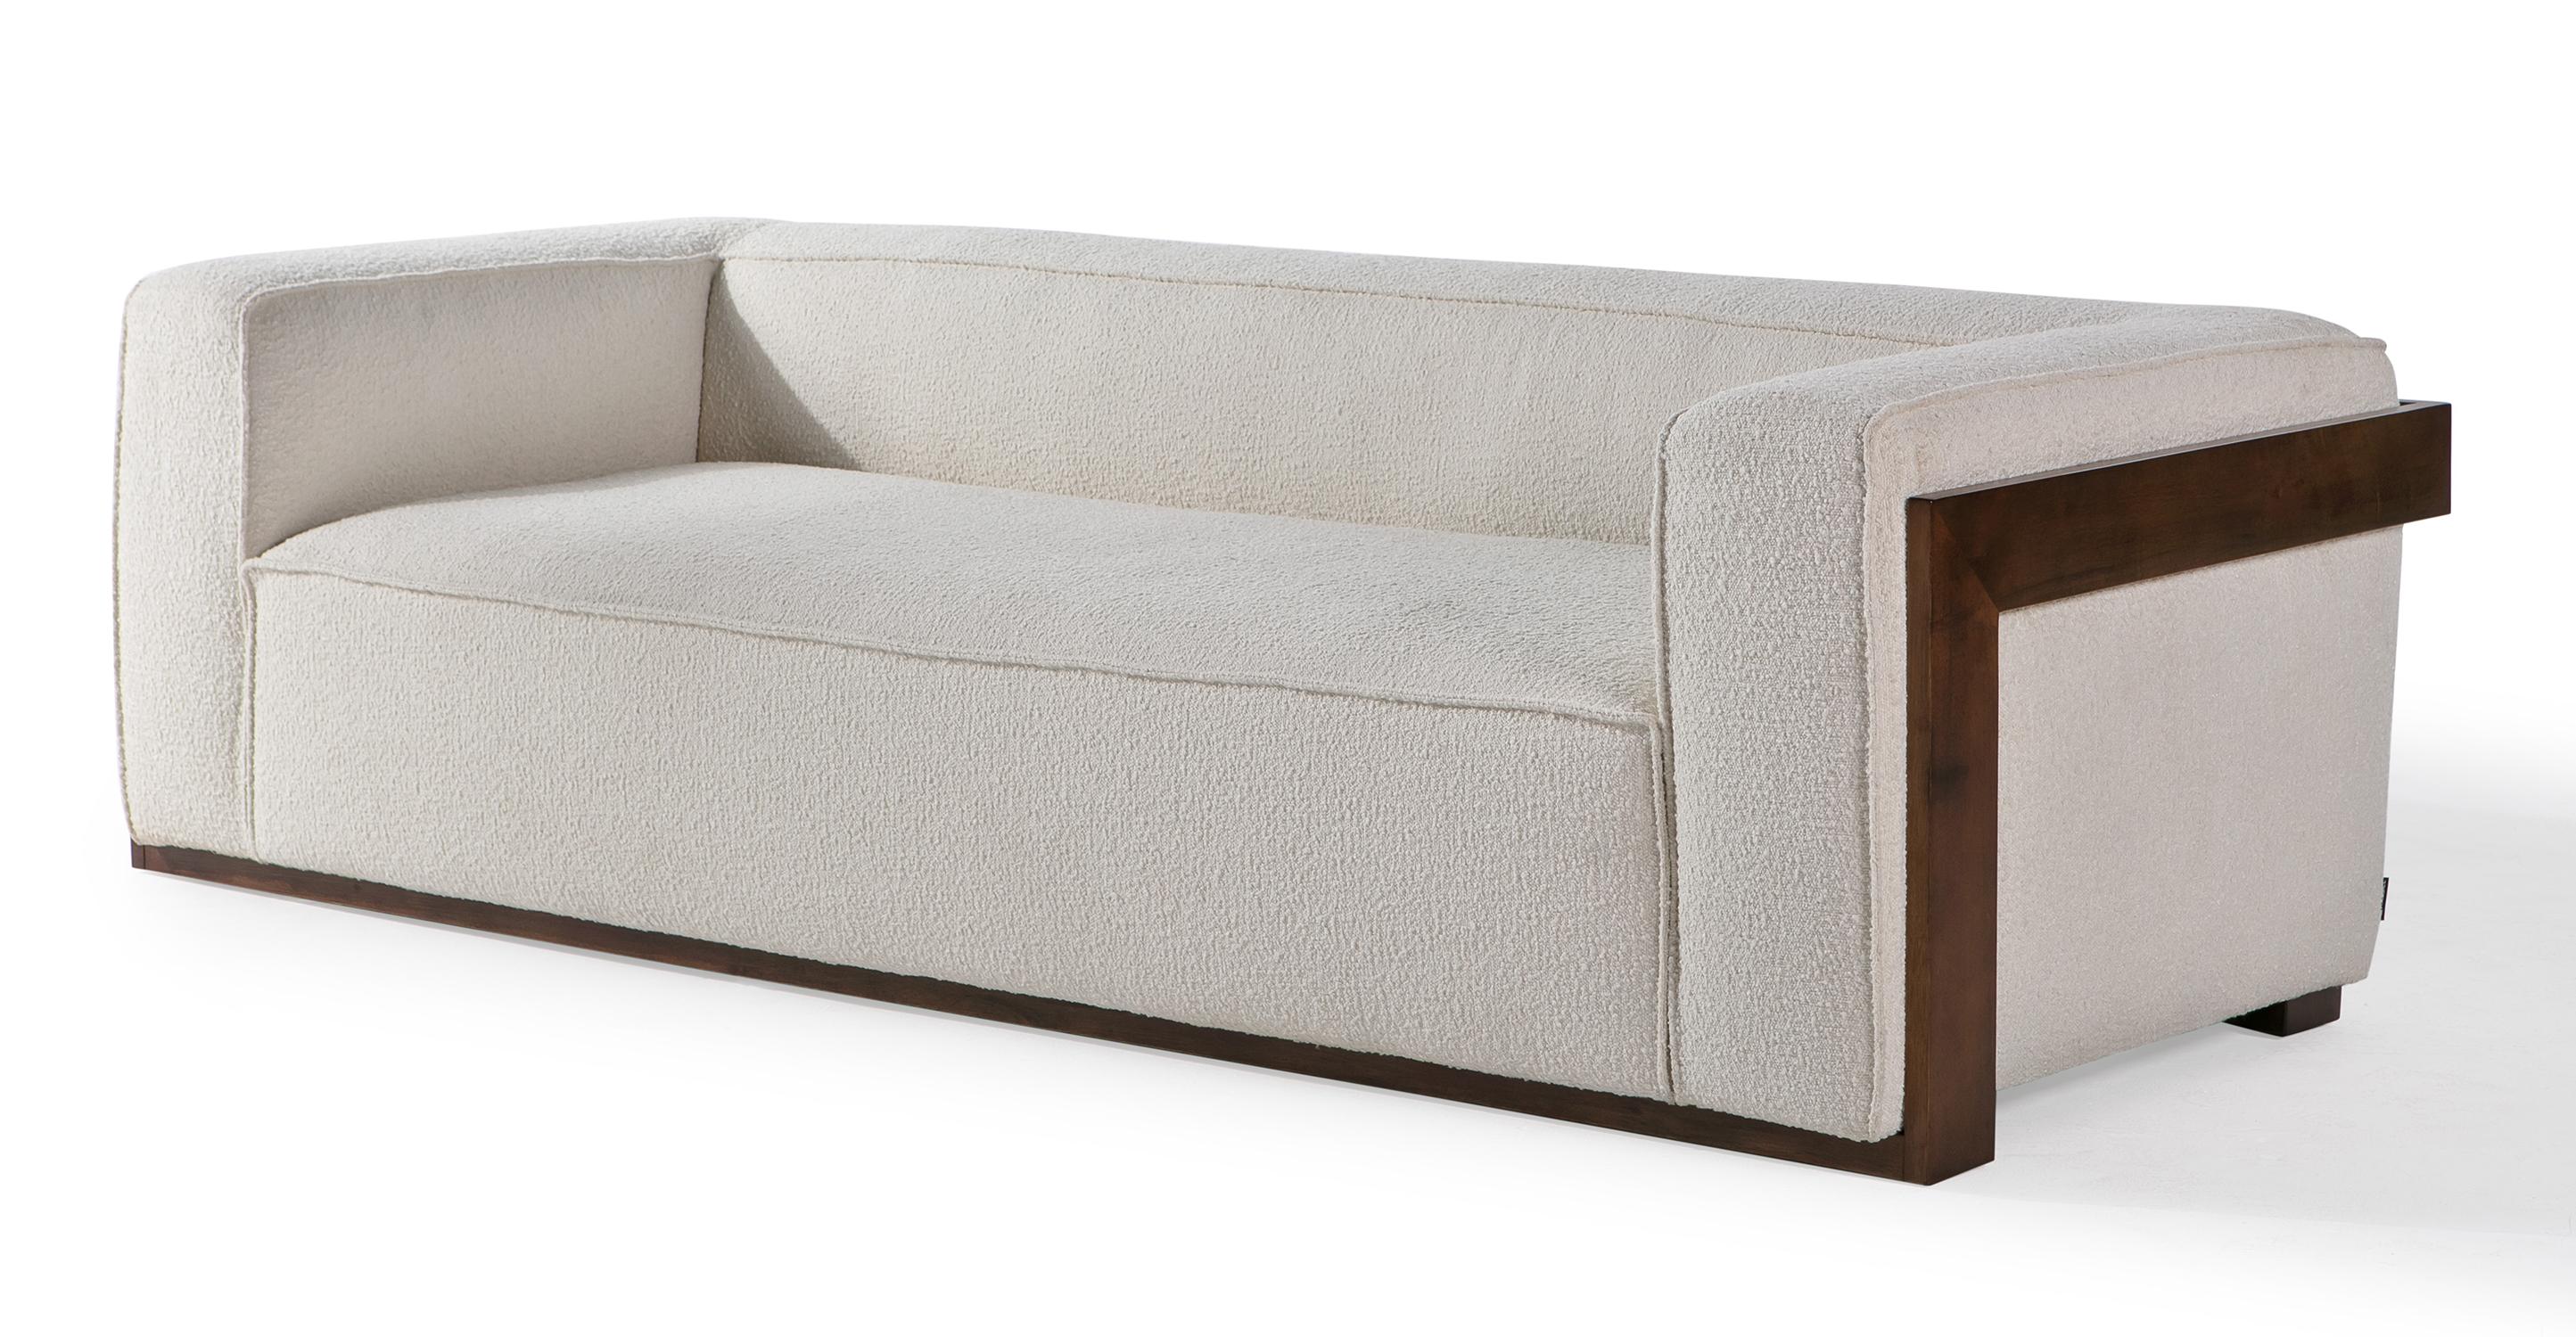 "Maddox 95"" Fabric Sofa, Cream Boucle"